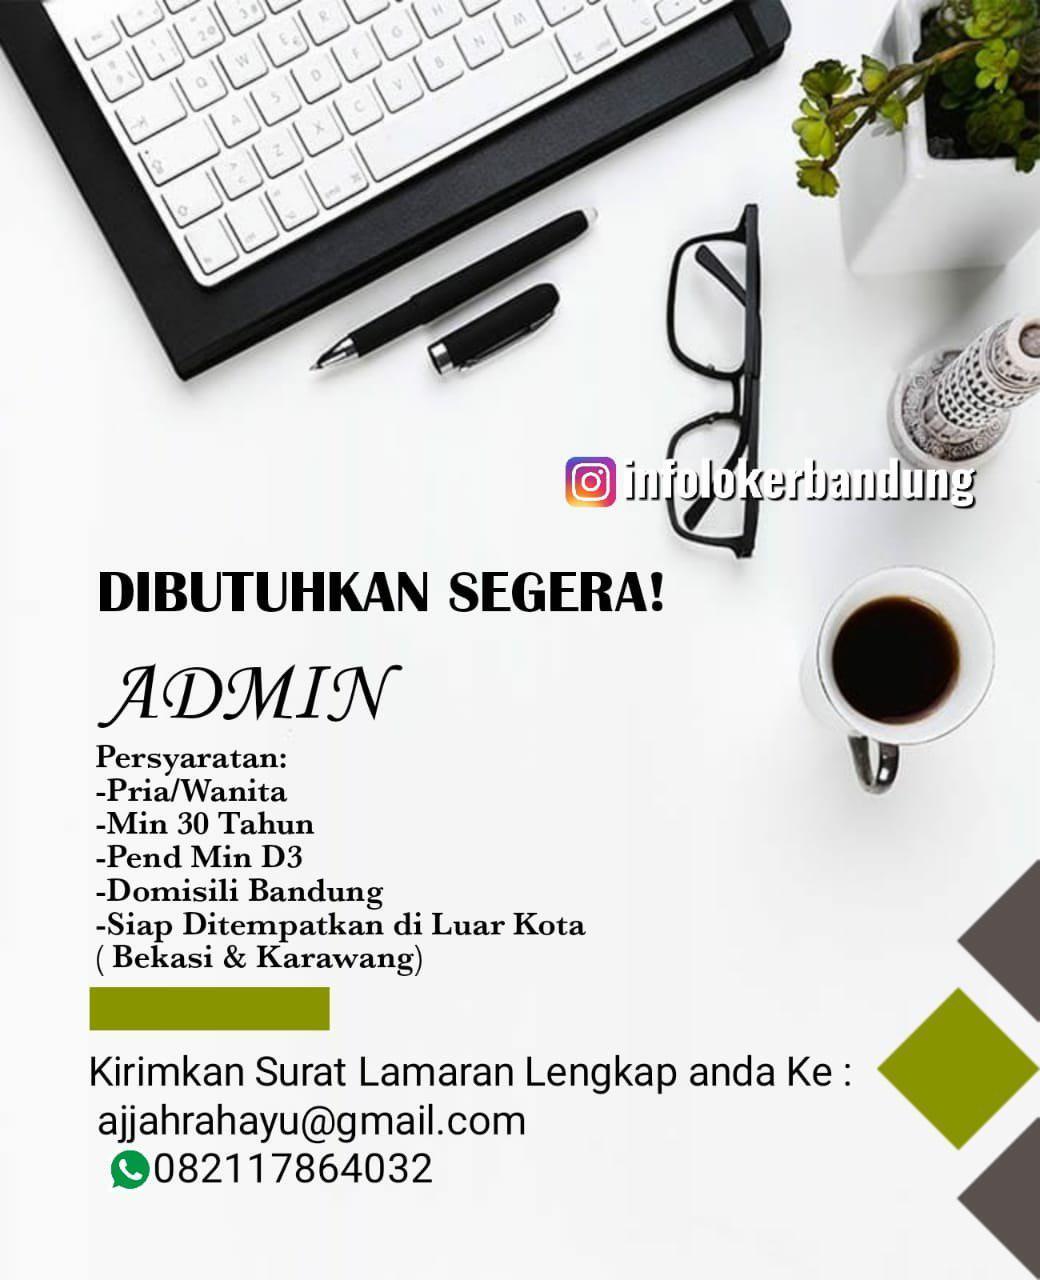 Lowongan Kerja Admin Bandung Juni 2019